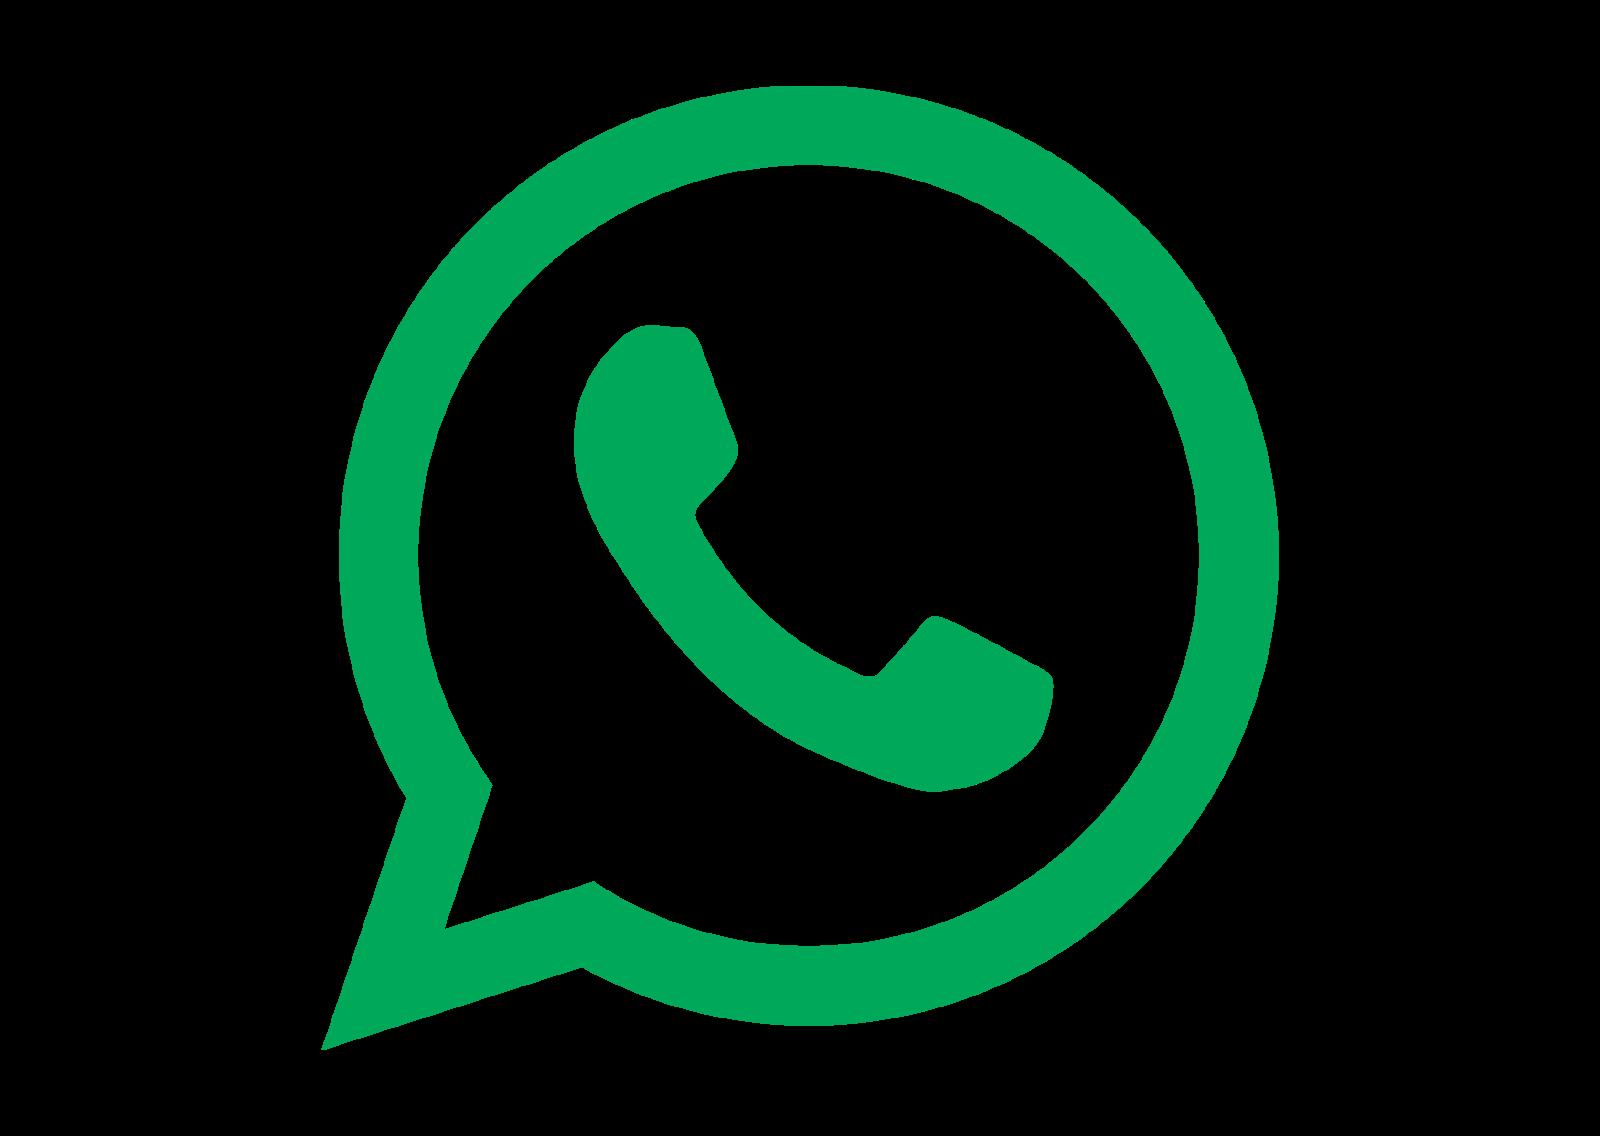 Whatsapp Logo Vector.